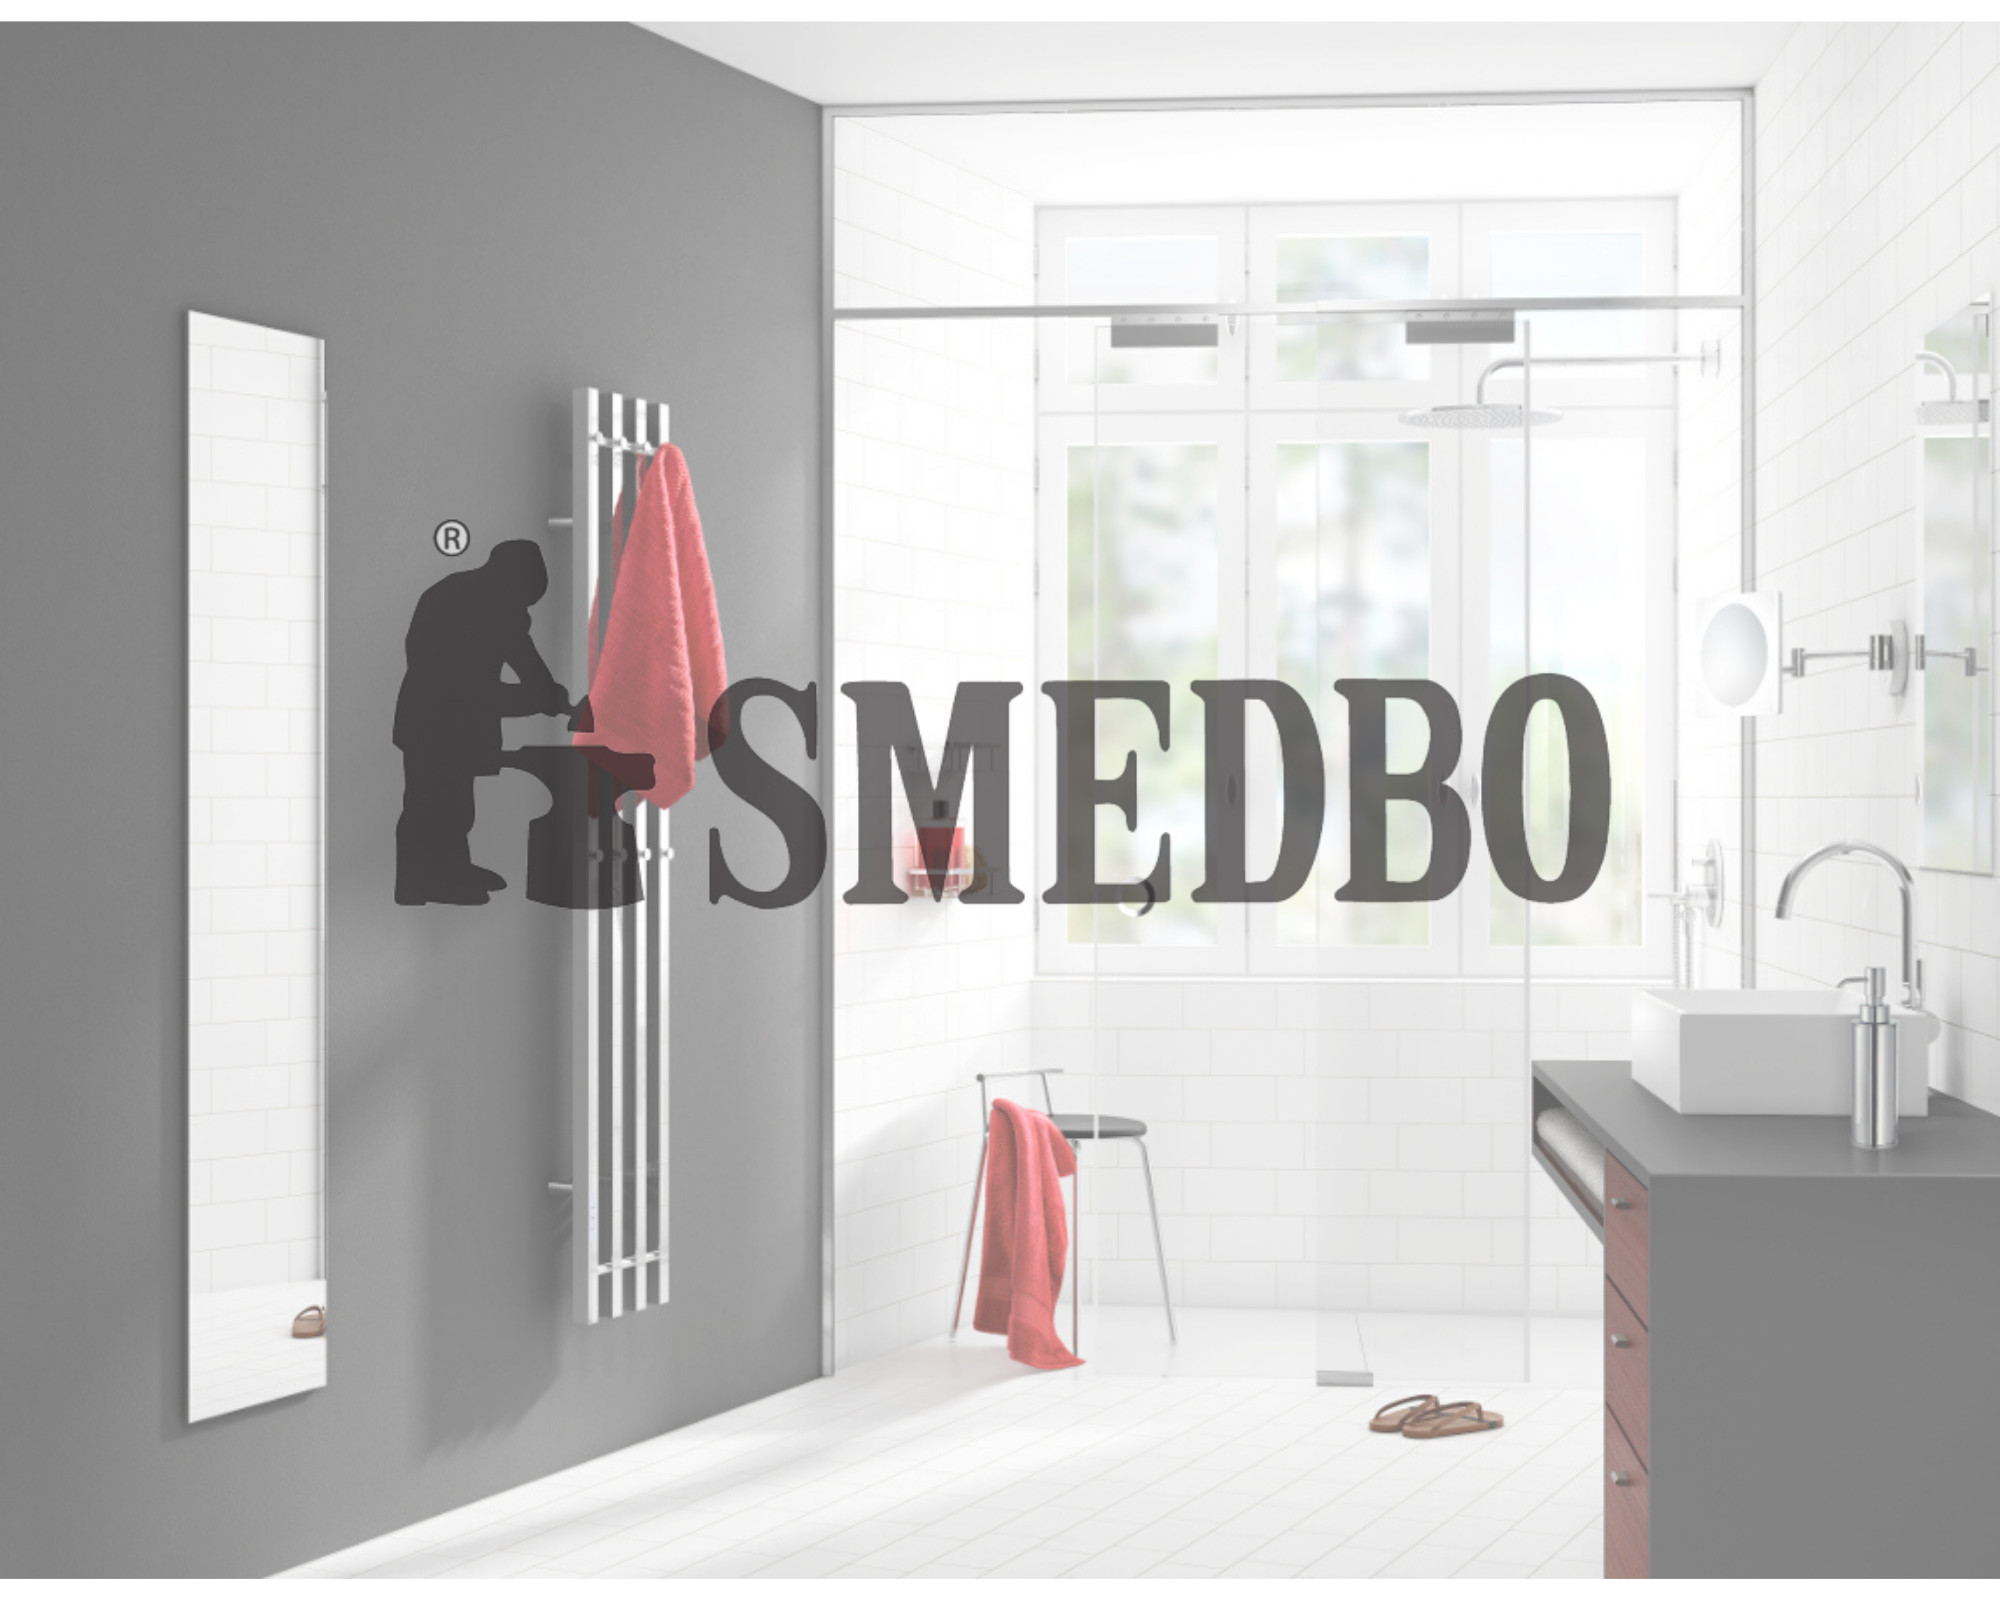 Smedbo (Švedija)